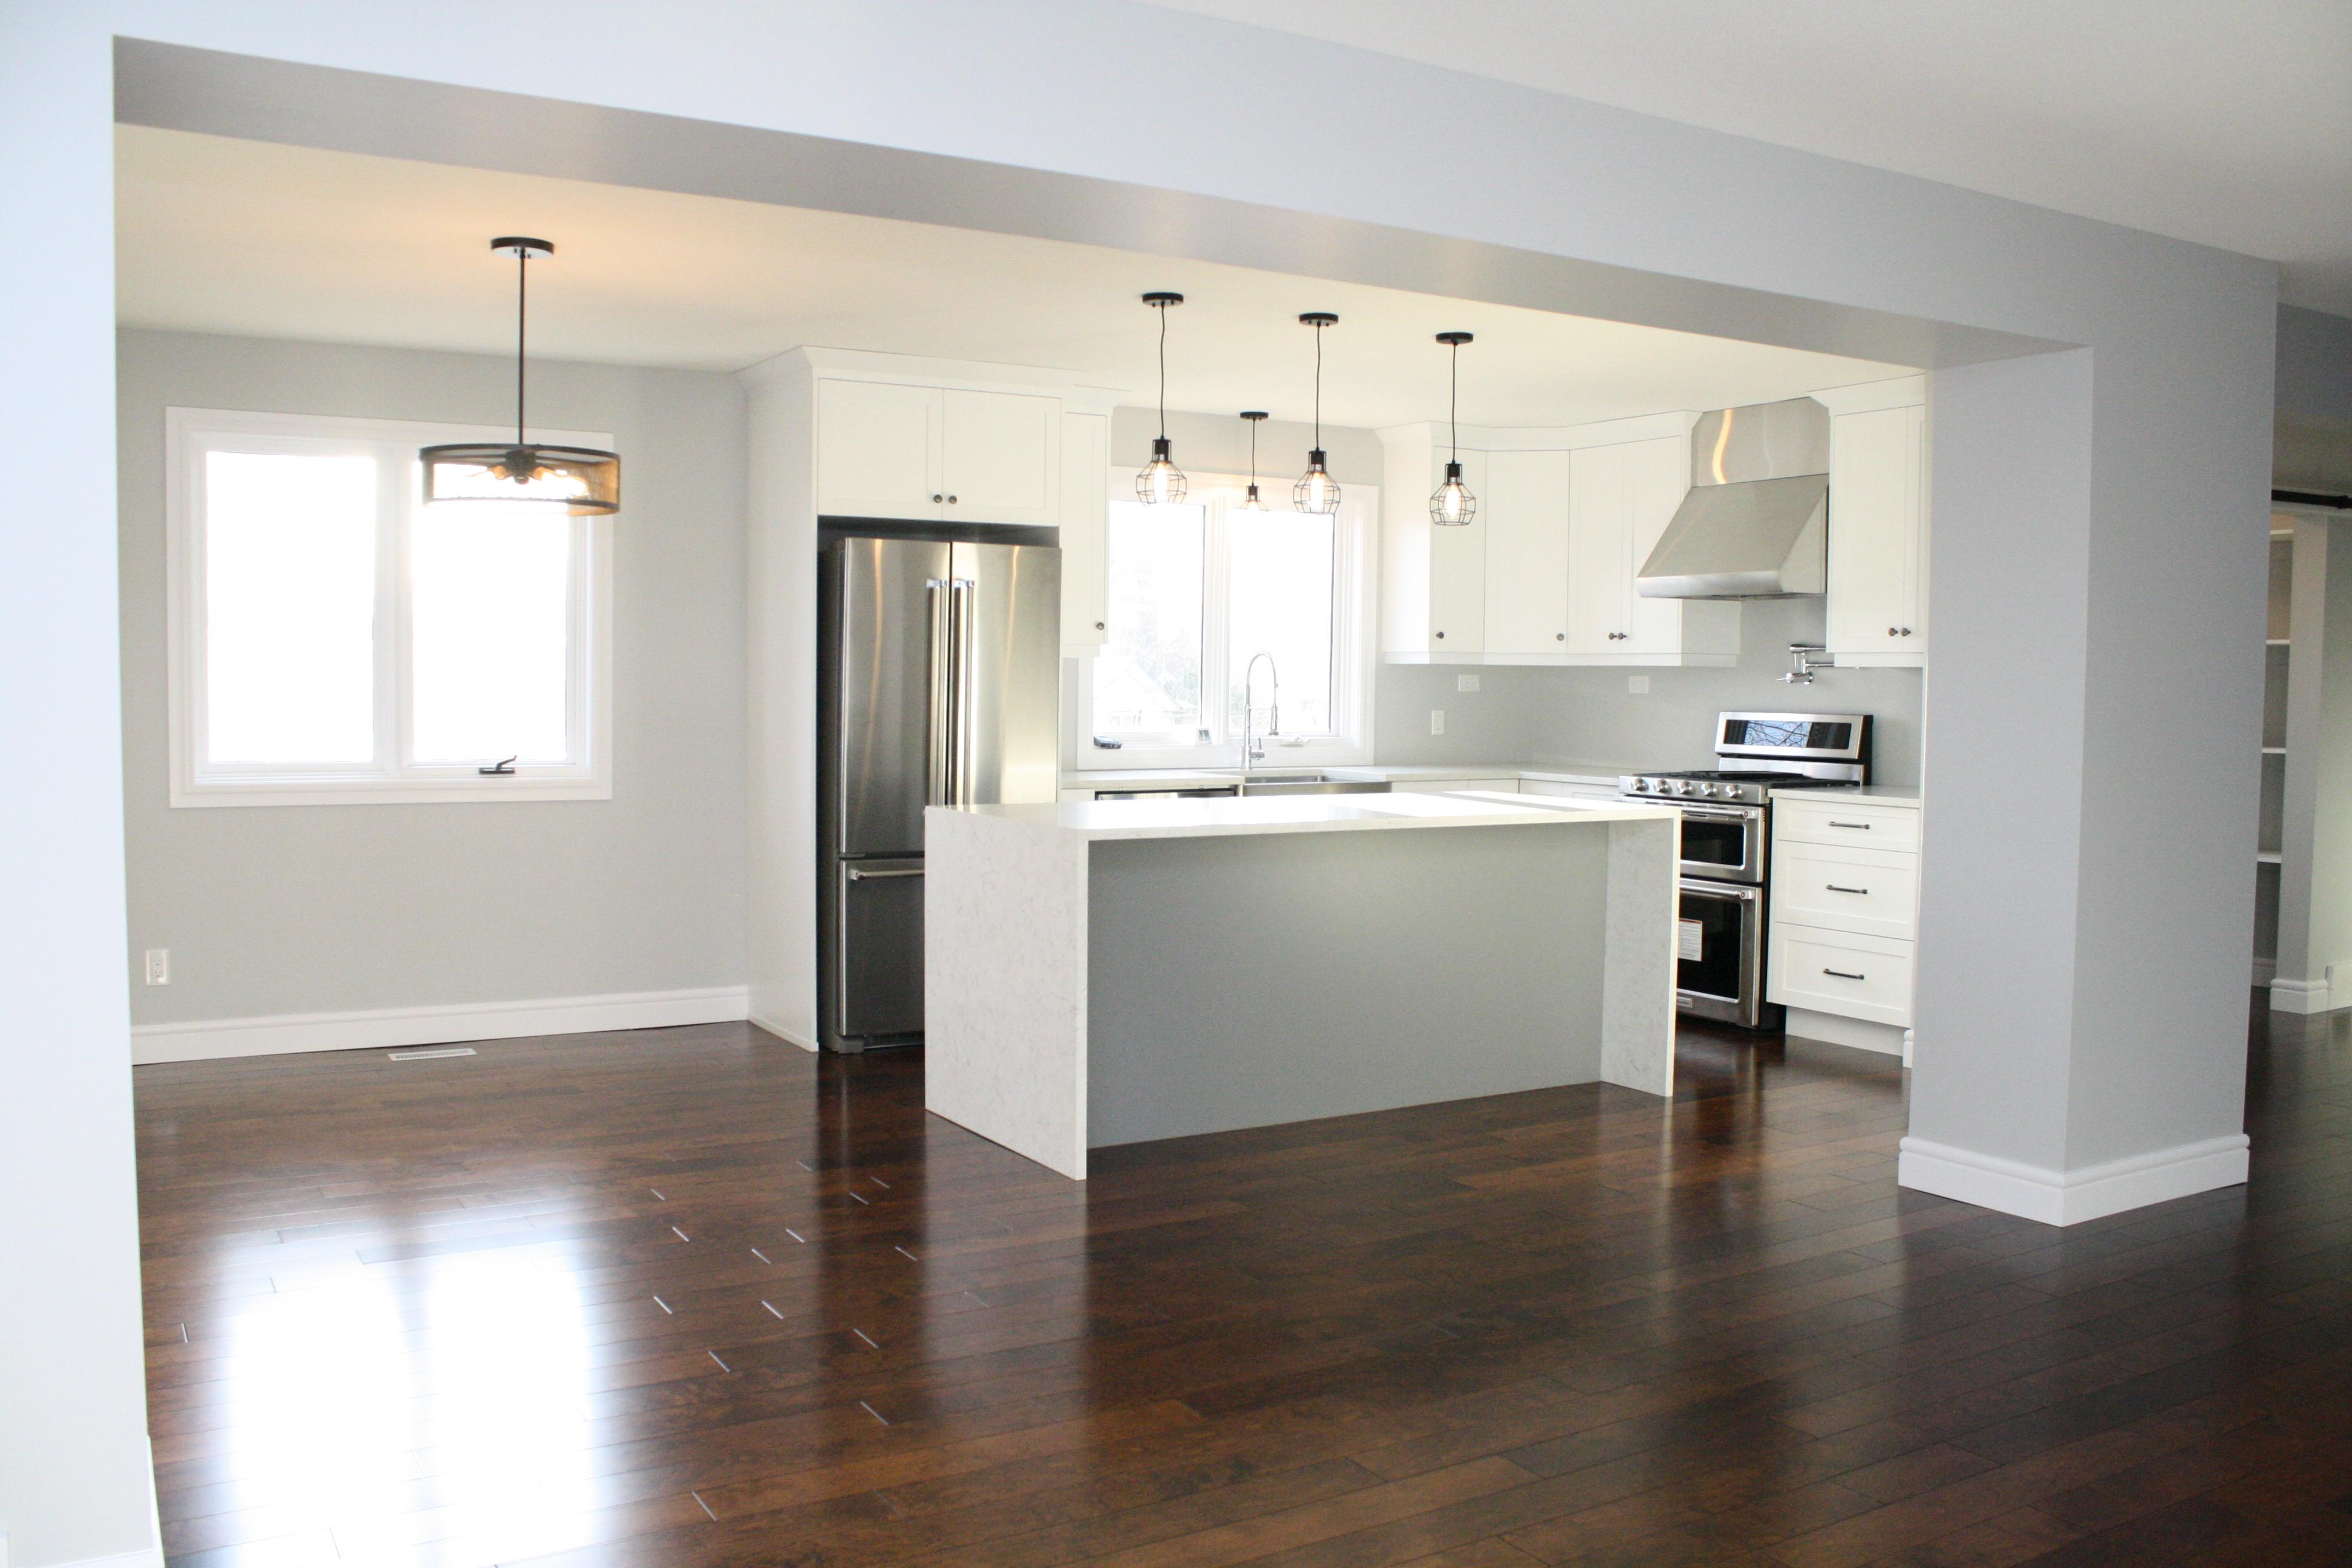 Krawchuk Construction Inc - Saskatoon Home Renovations - www.krawchukconstruction.com